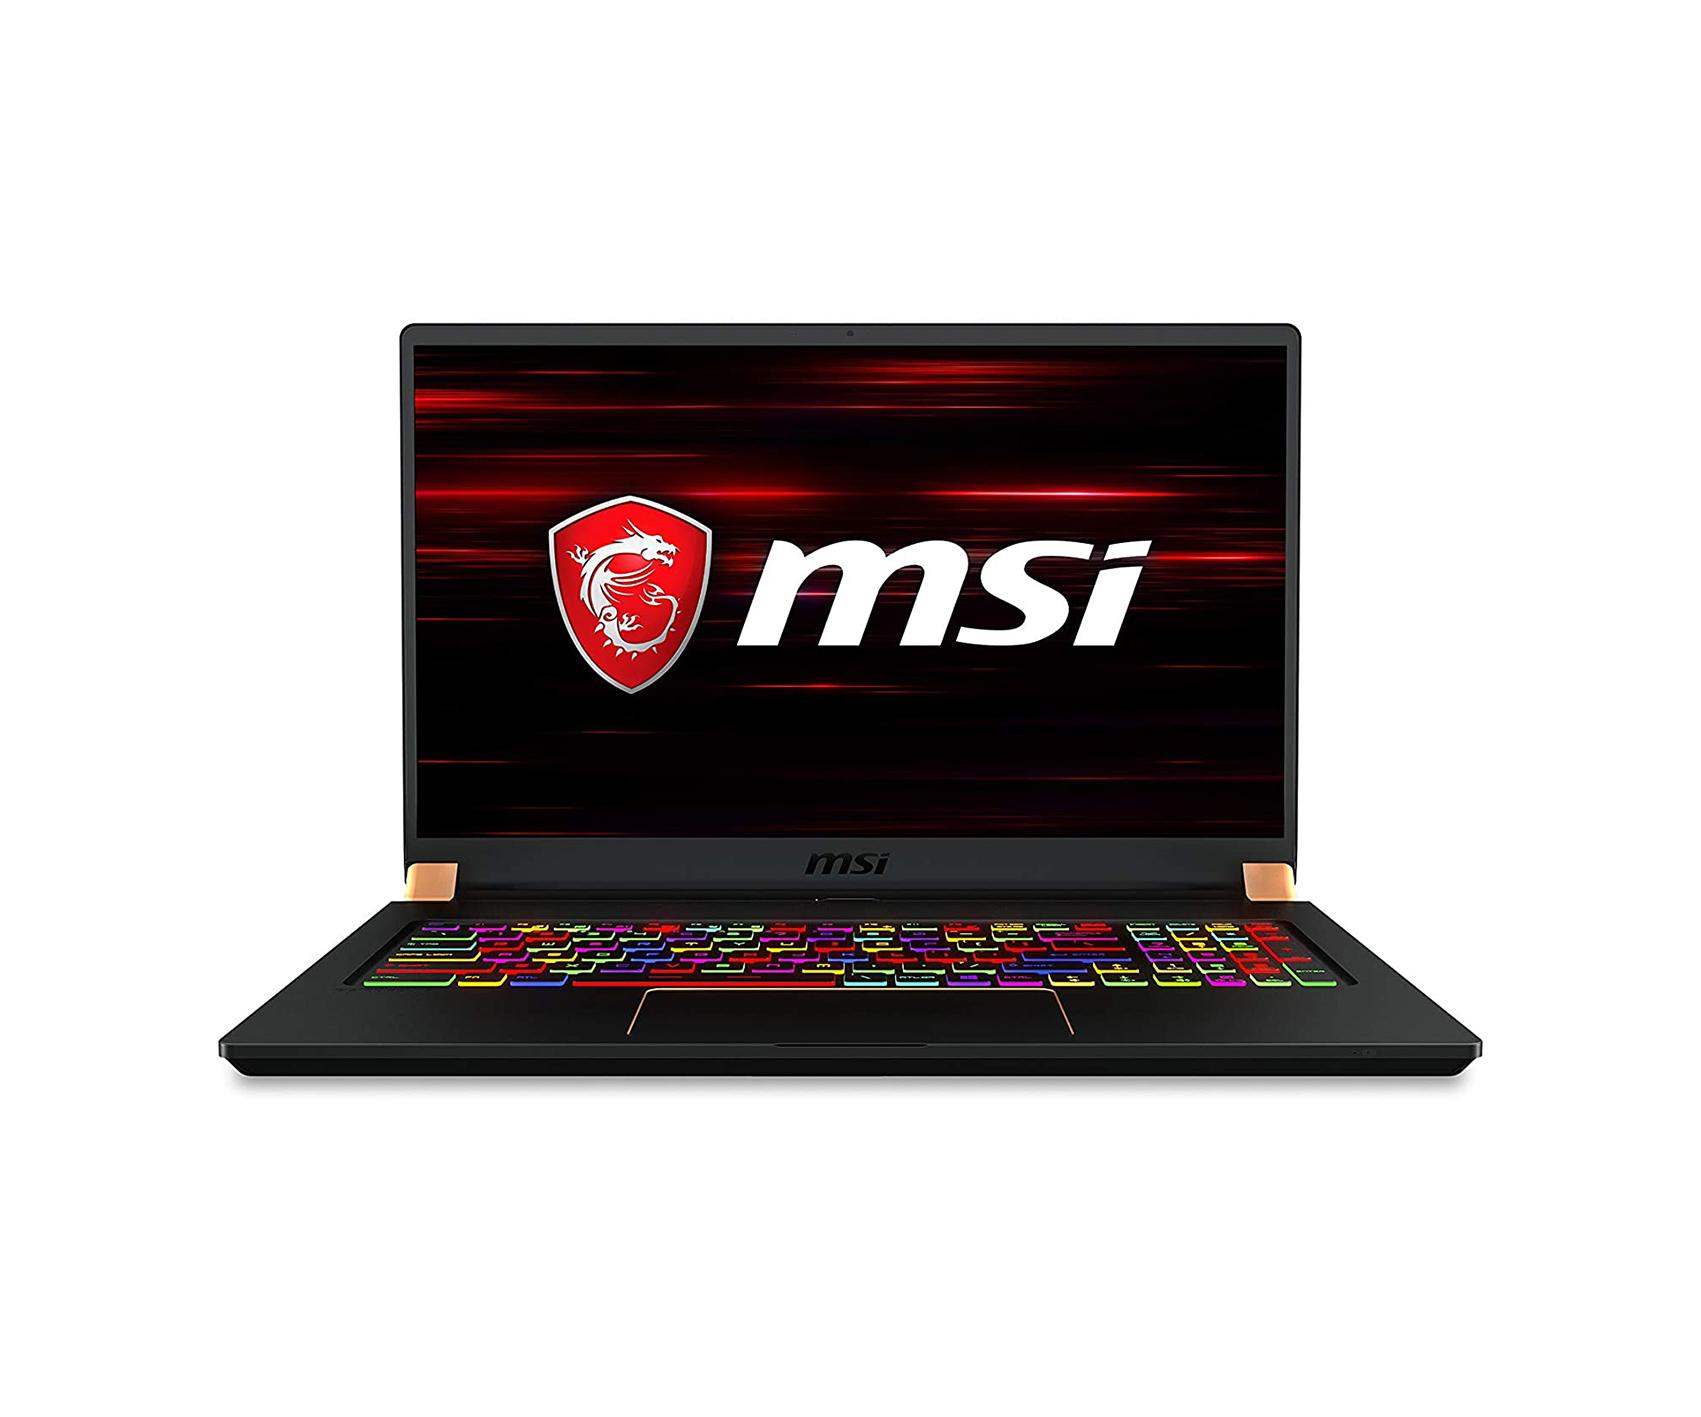 "MSI GS75 Stealth Gaming Laptop: 17.3"" 240Hz , i7-10875H, RTX 2060, 16GB RAM, 512GB SSD, Win 10 Pro, Black (10SE-620)"